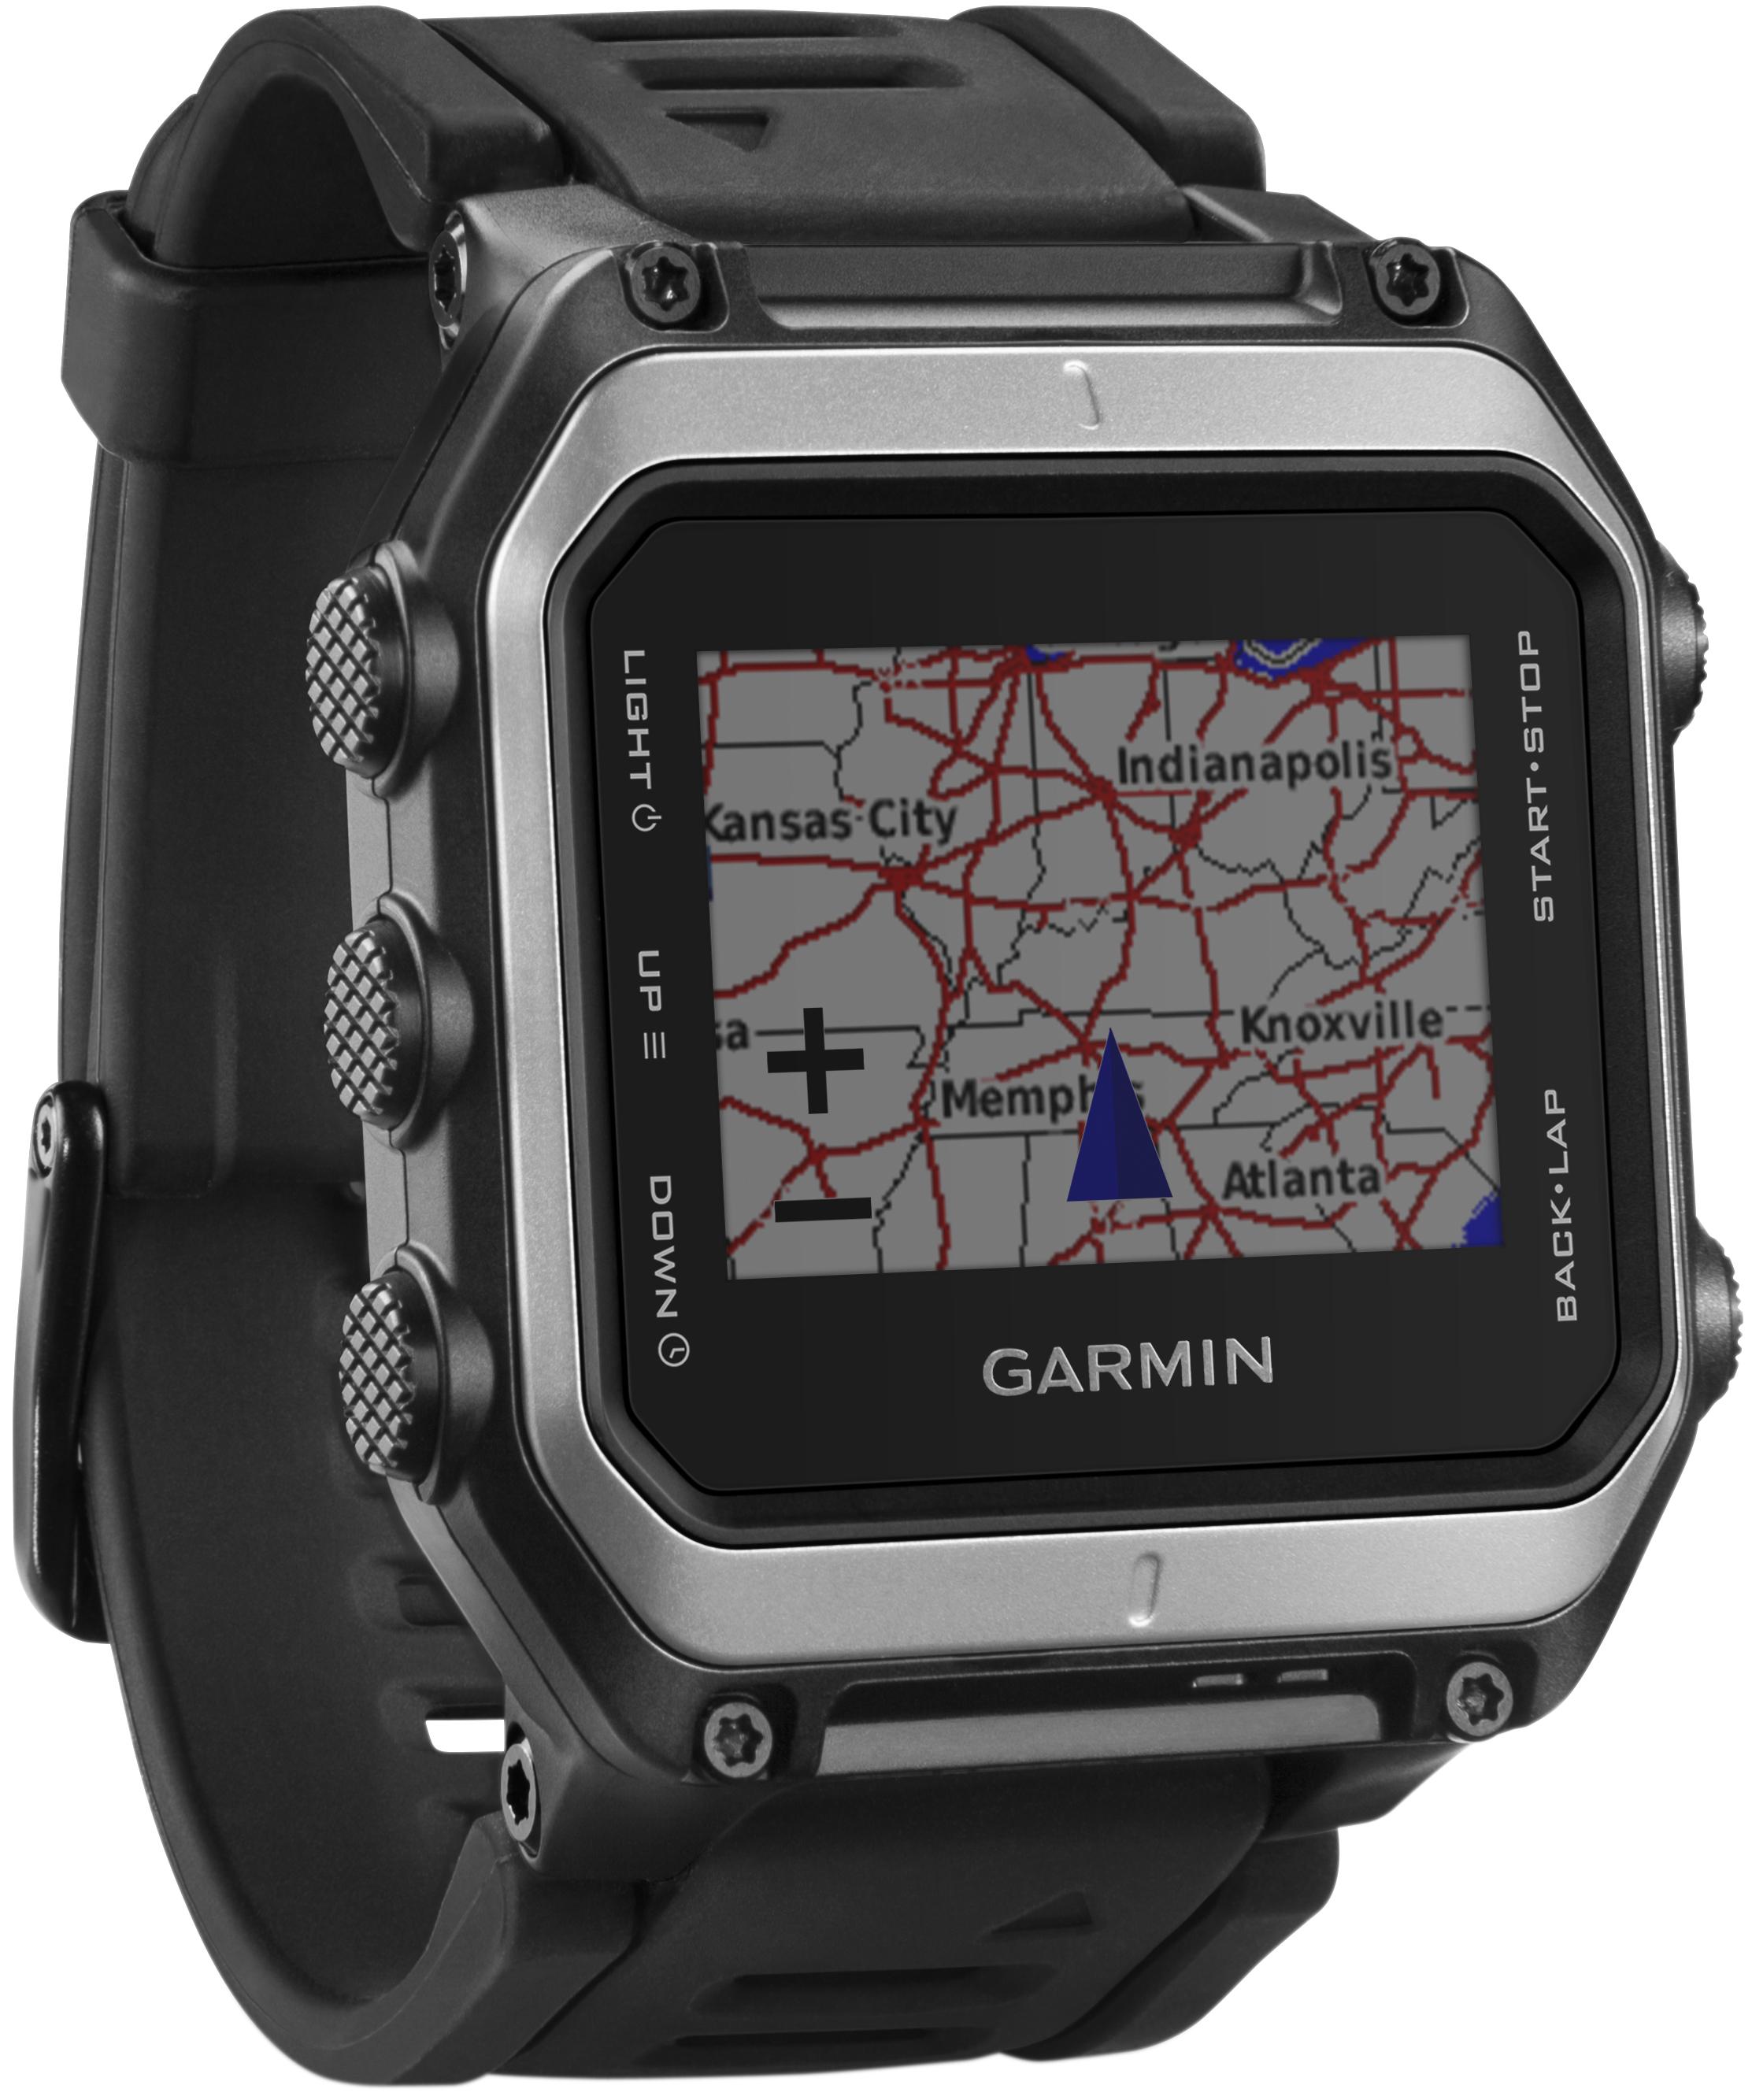 Garmin Gps Watch >> Garmin Epix Topo Canada